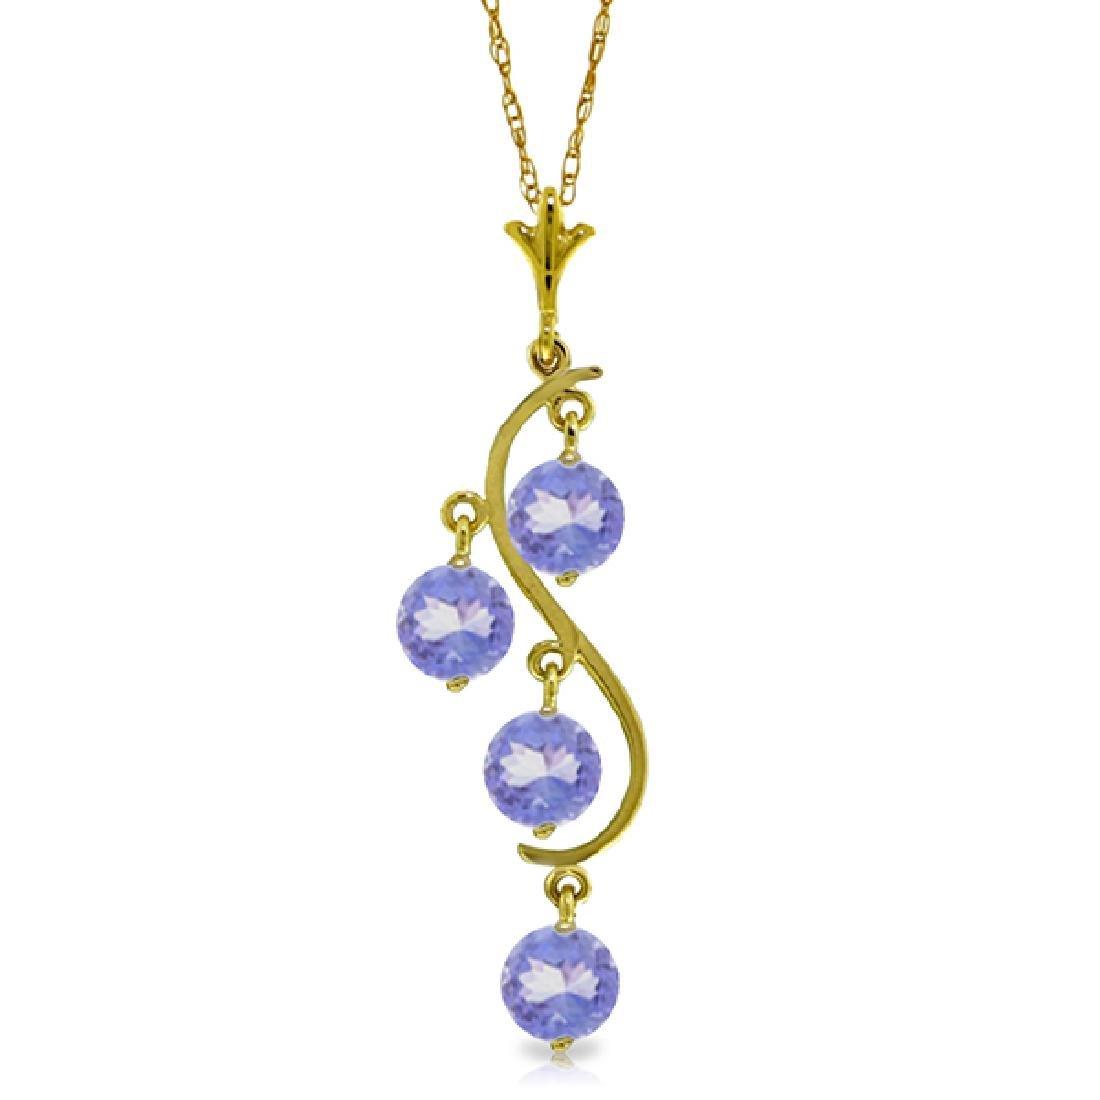 Genuine 2 ctw Tanzanite Necklace Jewelry 14KT Yellow